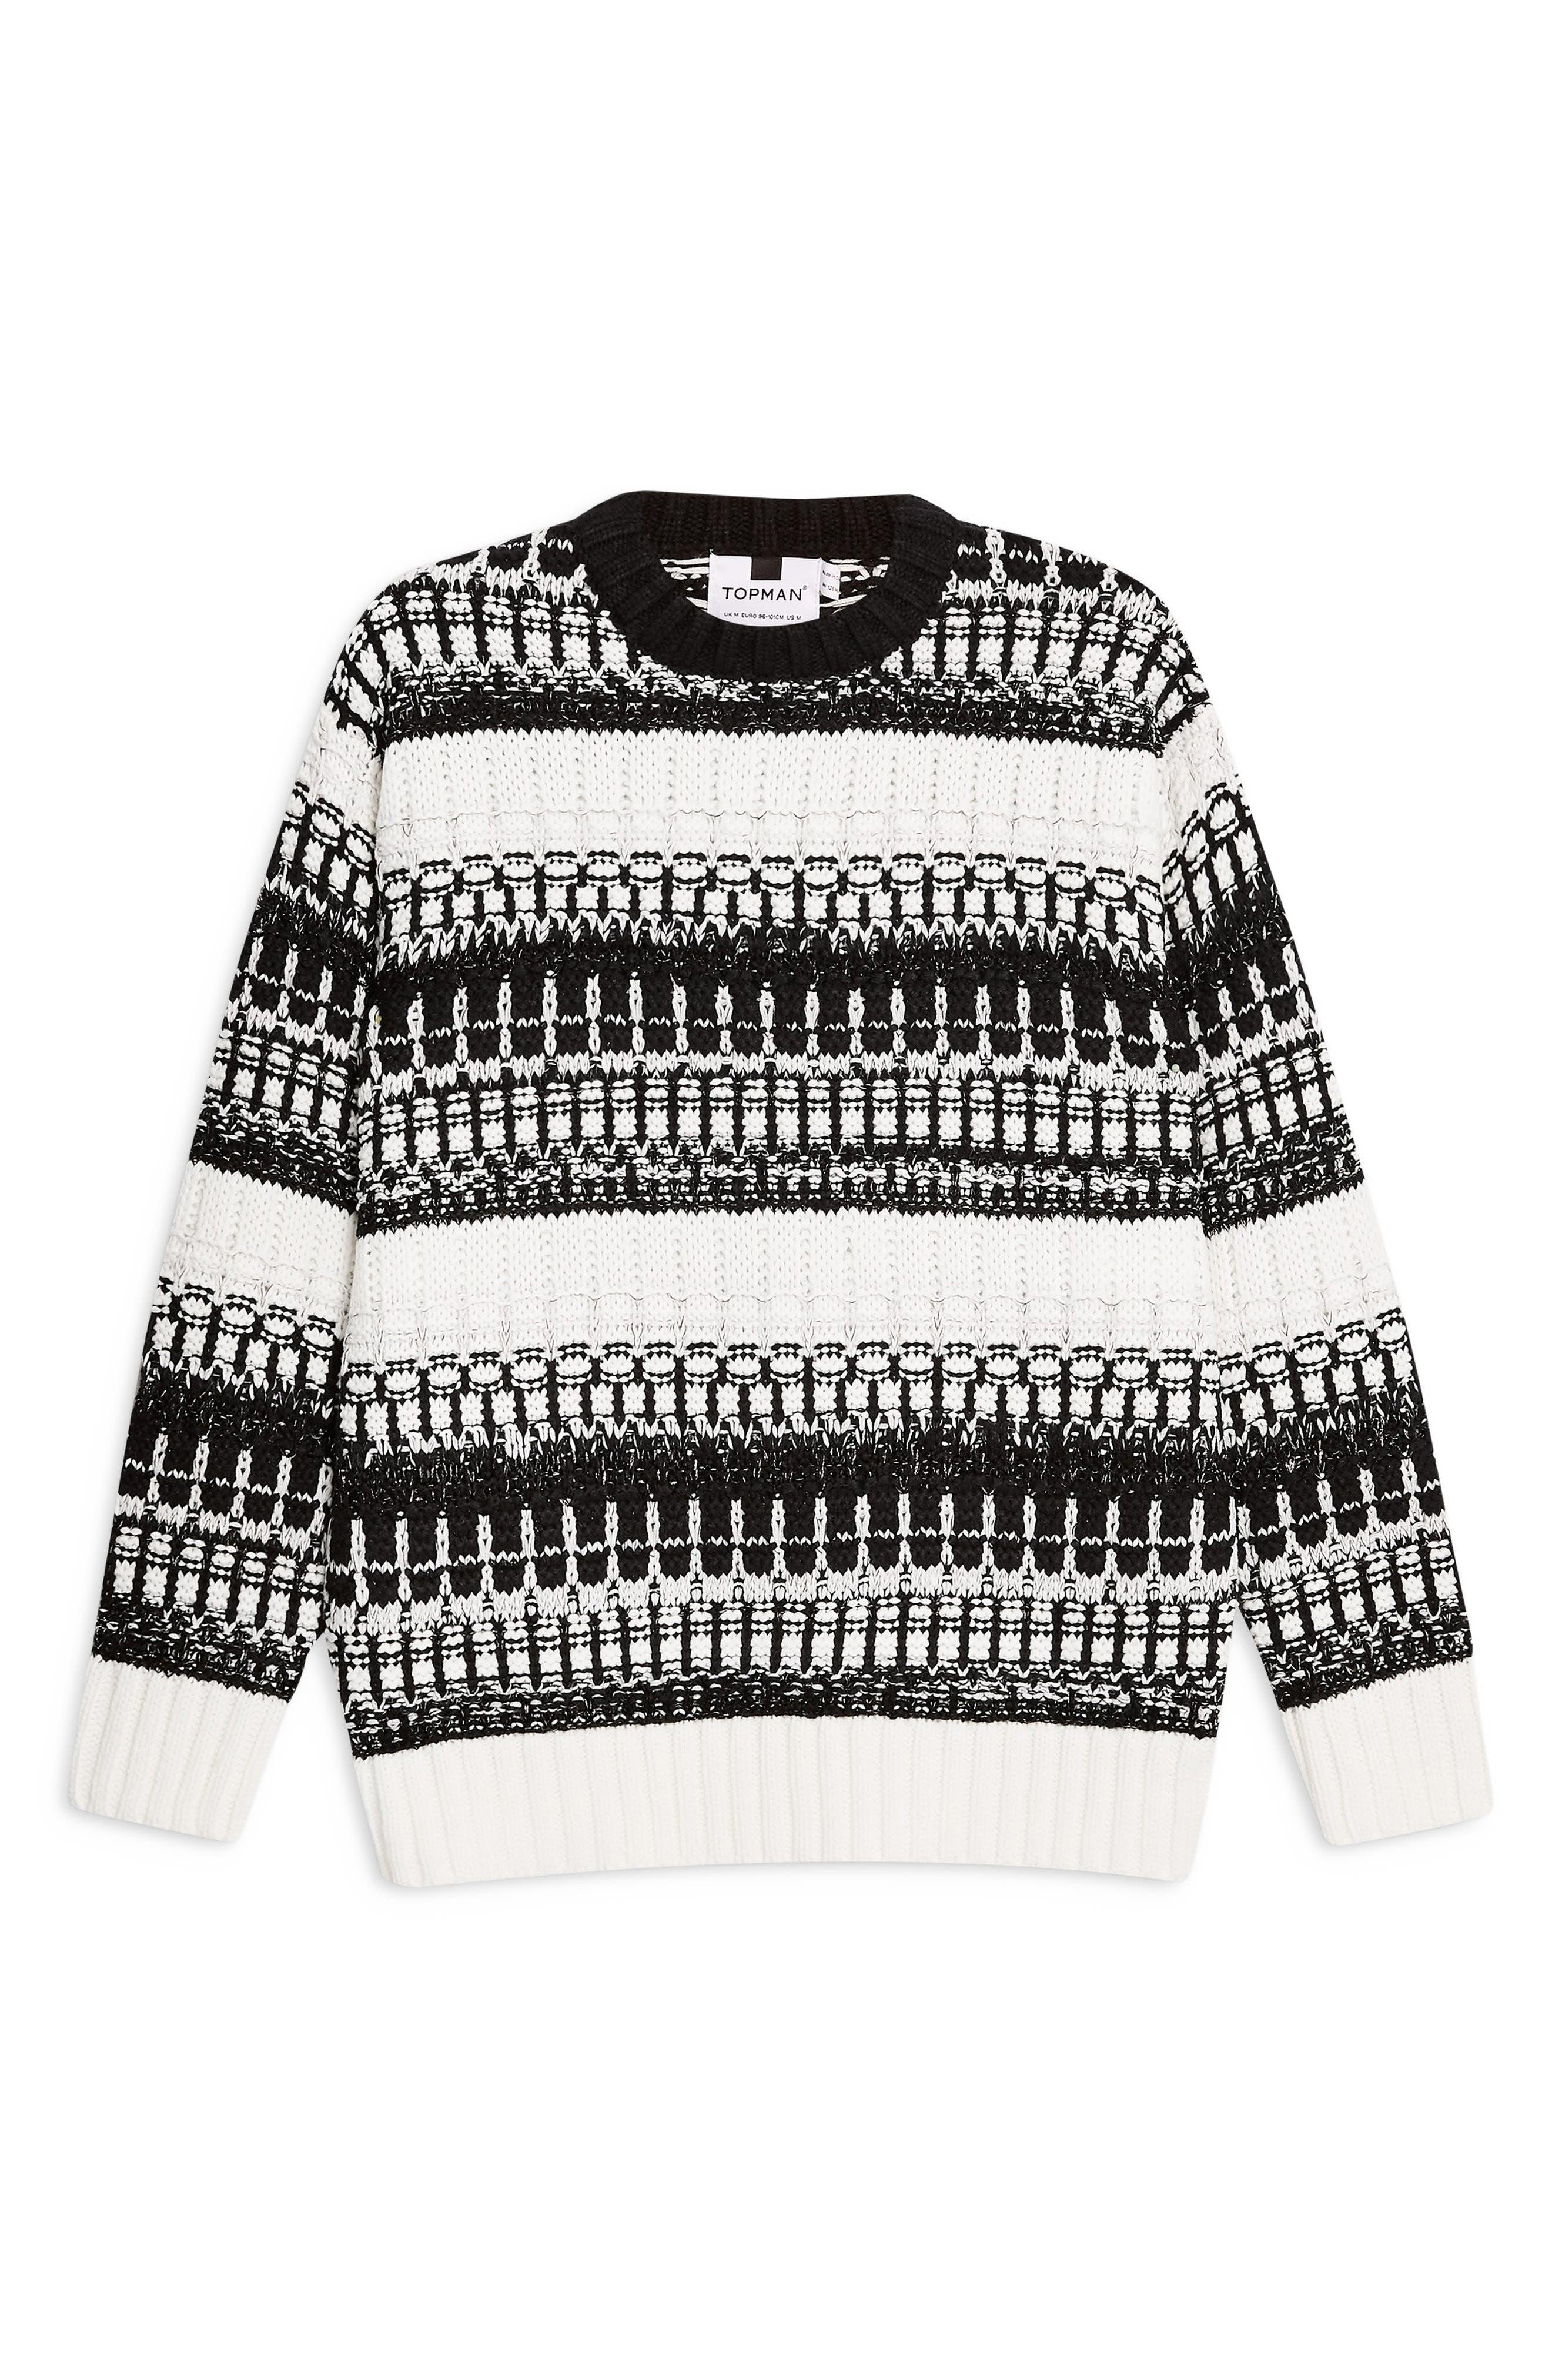 TOPMAN,                             Mono Texture Sweater,                             Alternate thumbnail 3, color,                             CREAM MULTI